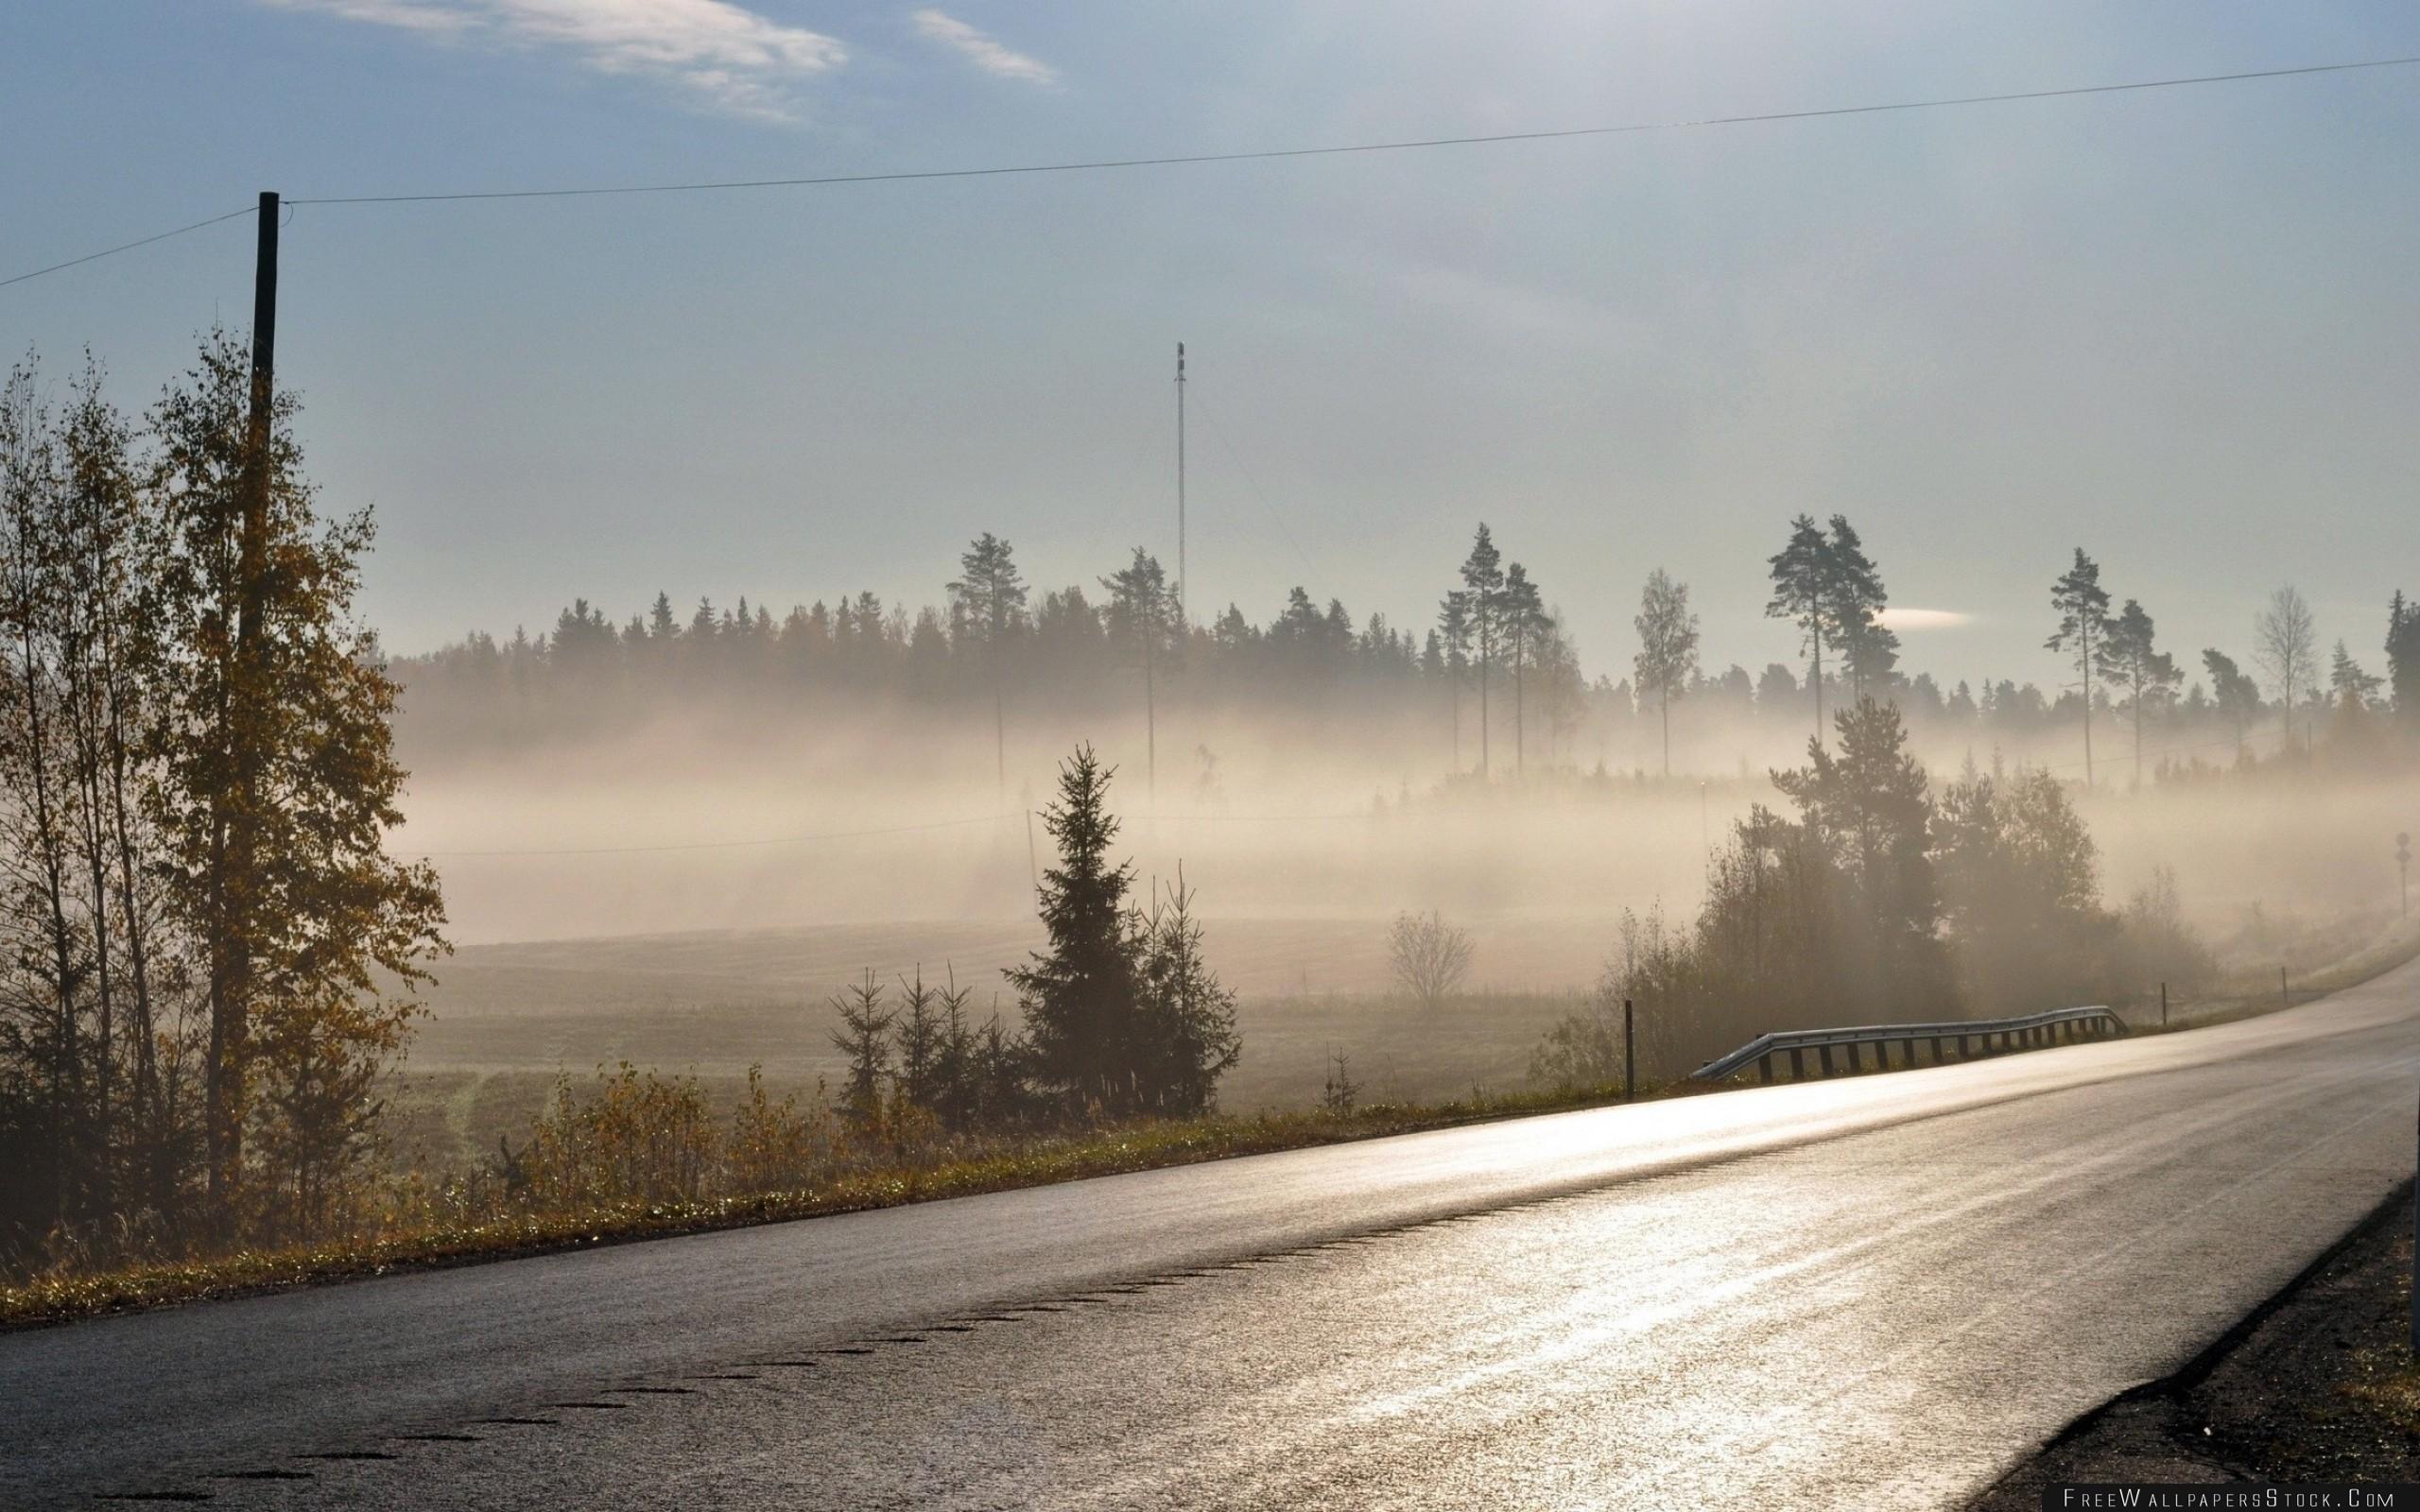 Download Free Wallpaper Road Asphalt Fog Morning Freshness Shine Trees Wires